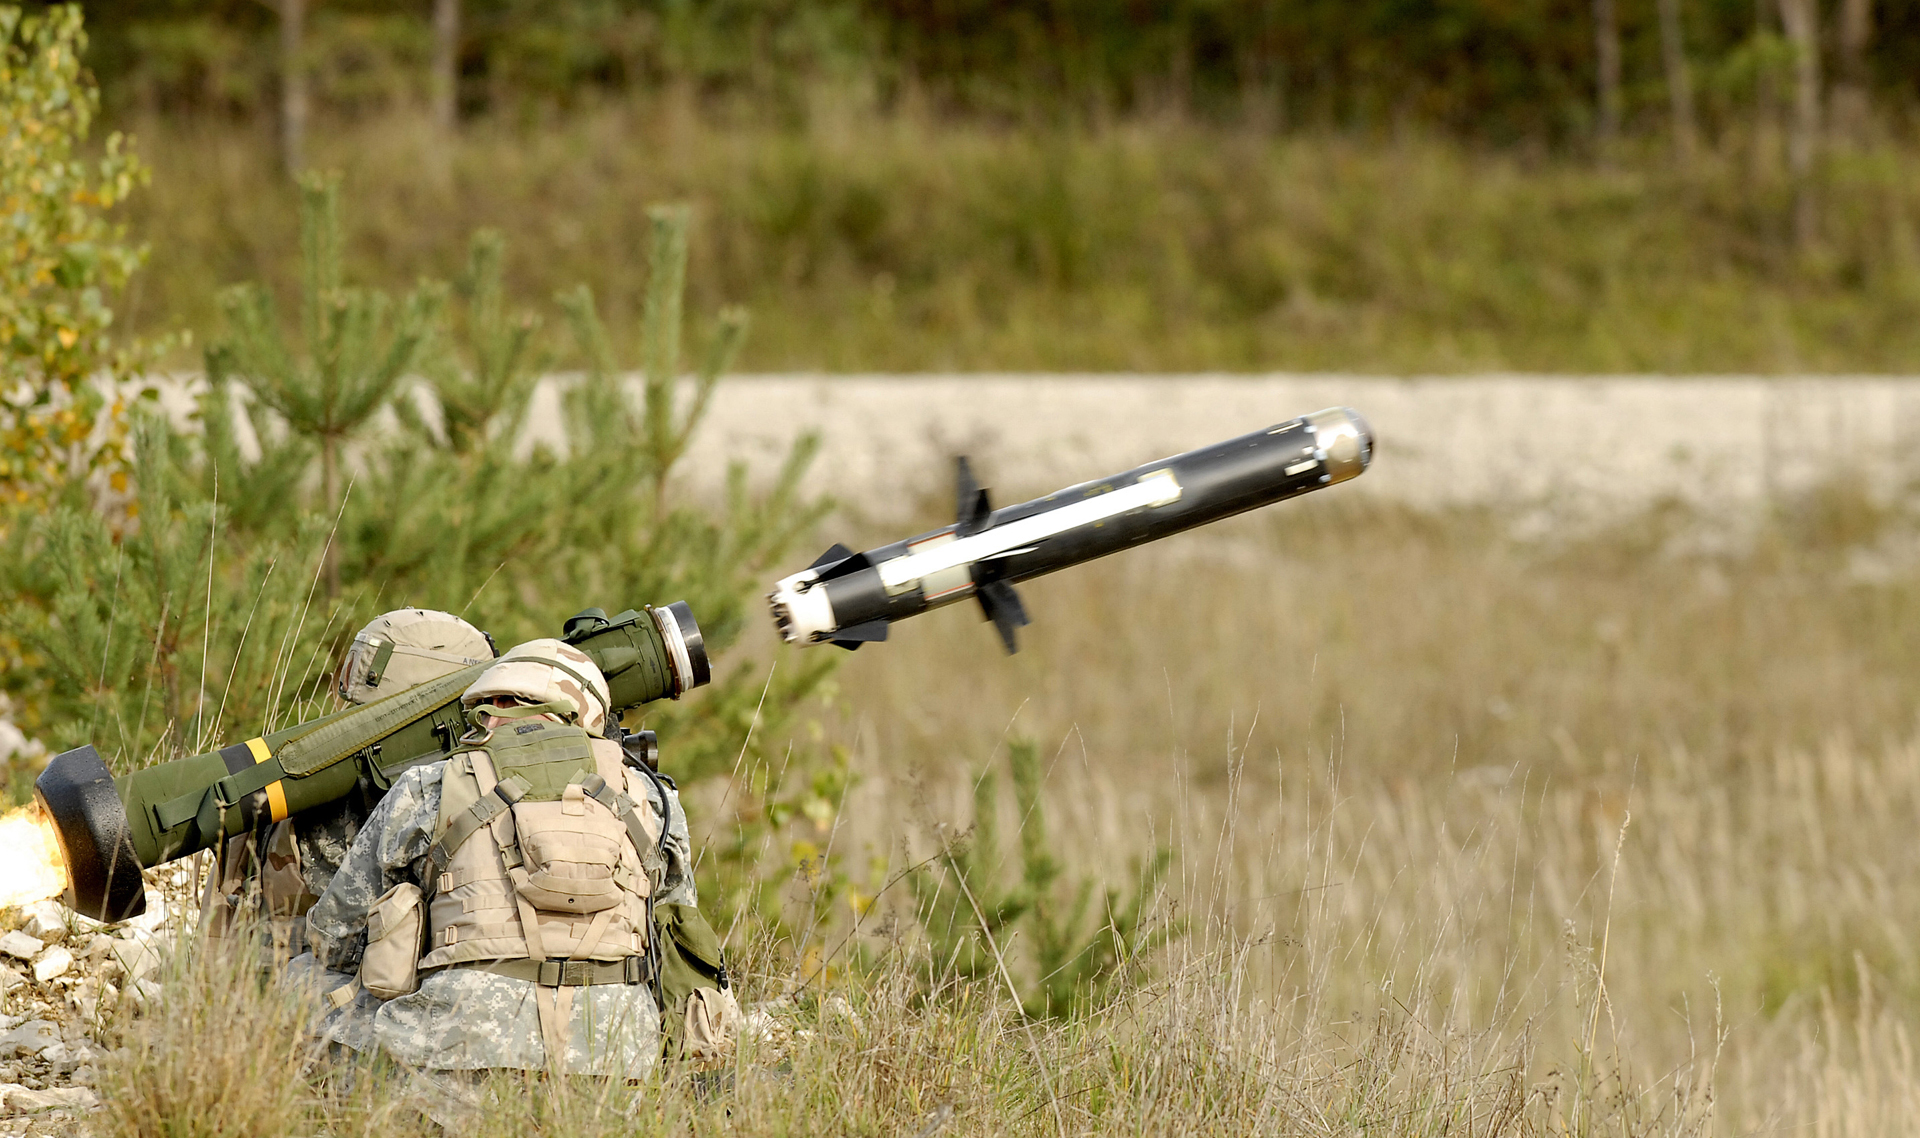 Militär - Rocket  Hintergrundbild